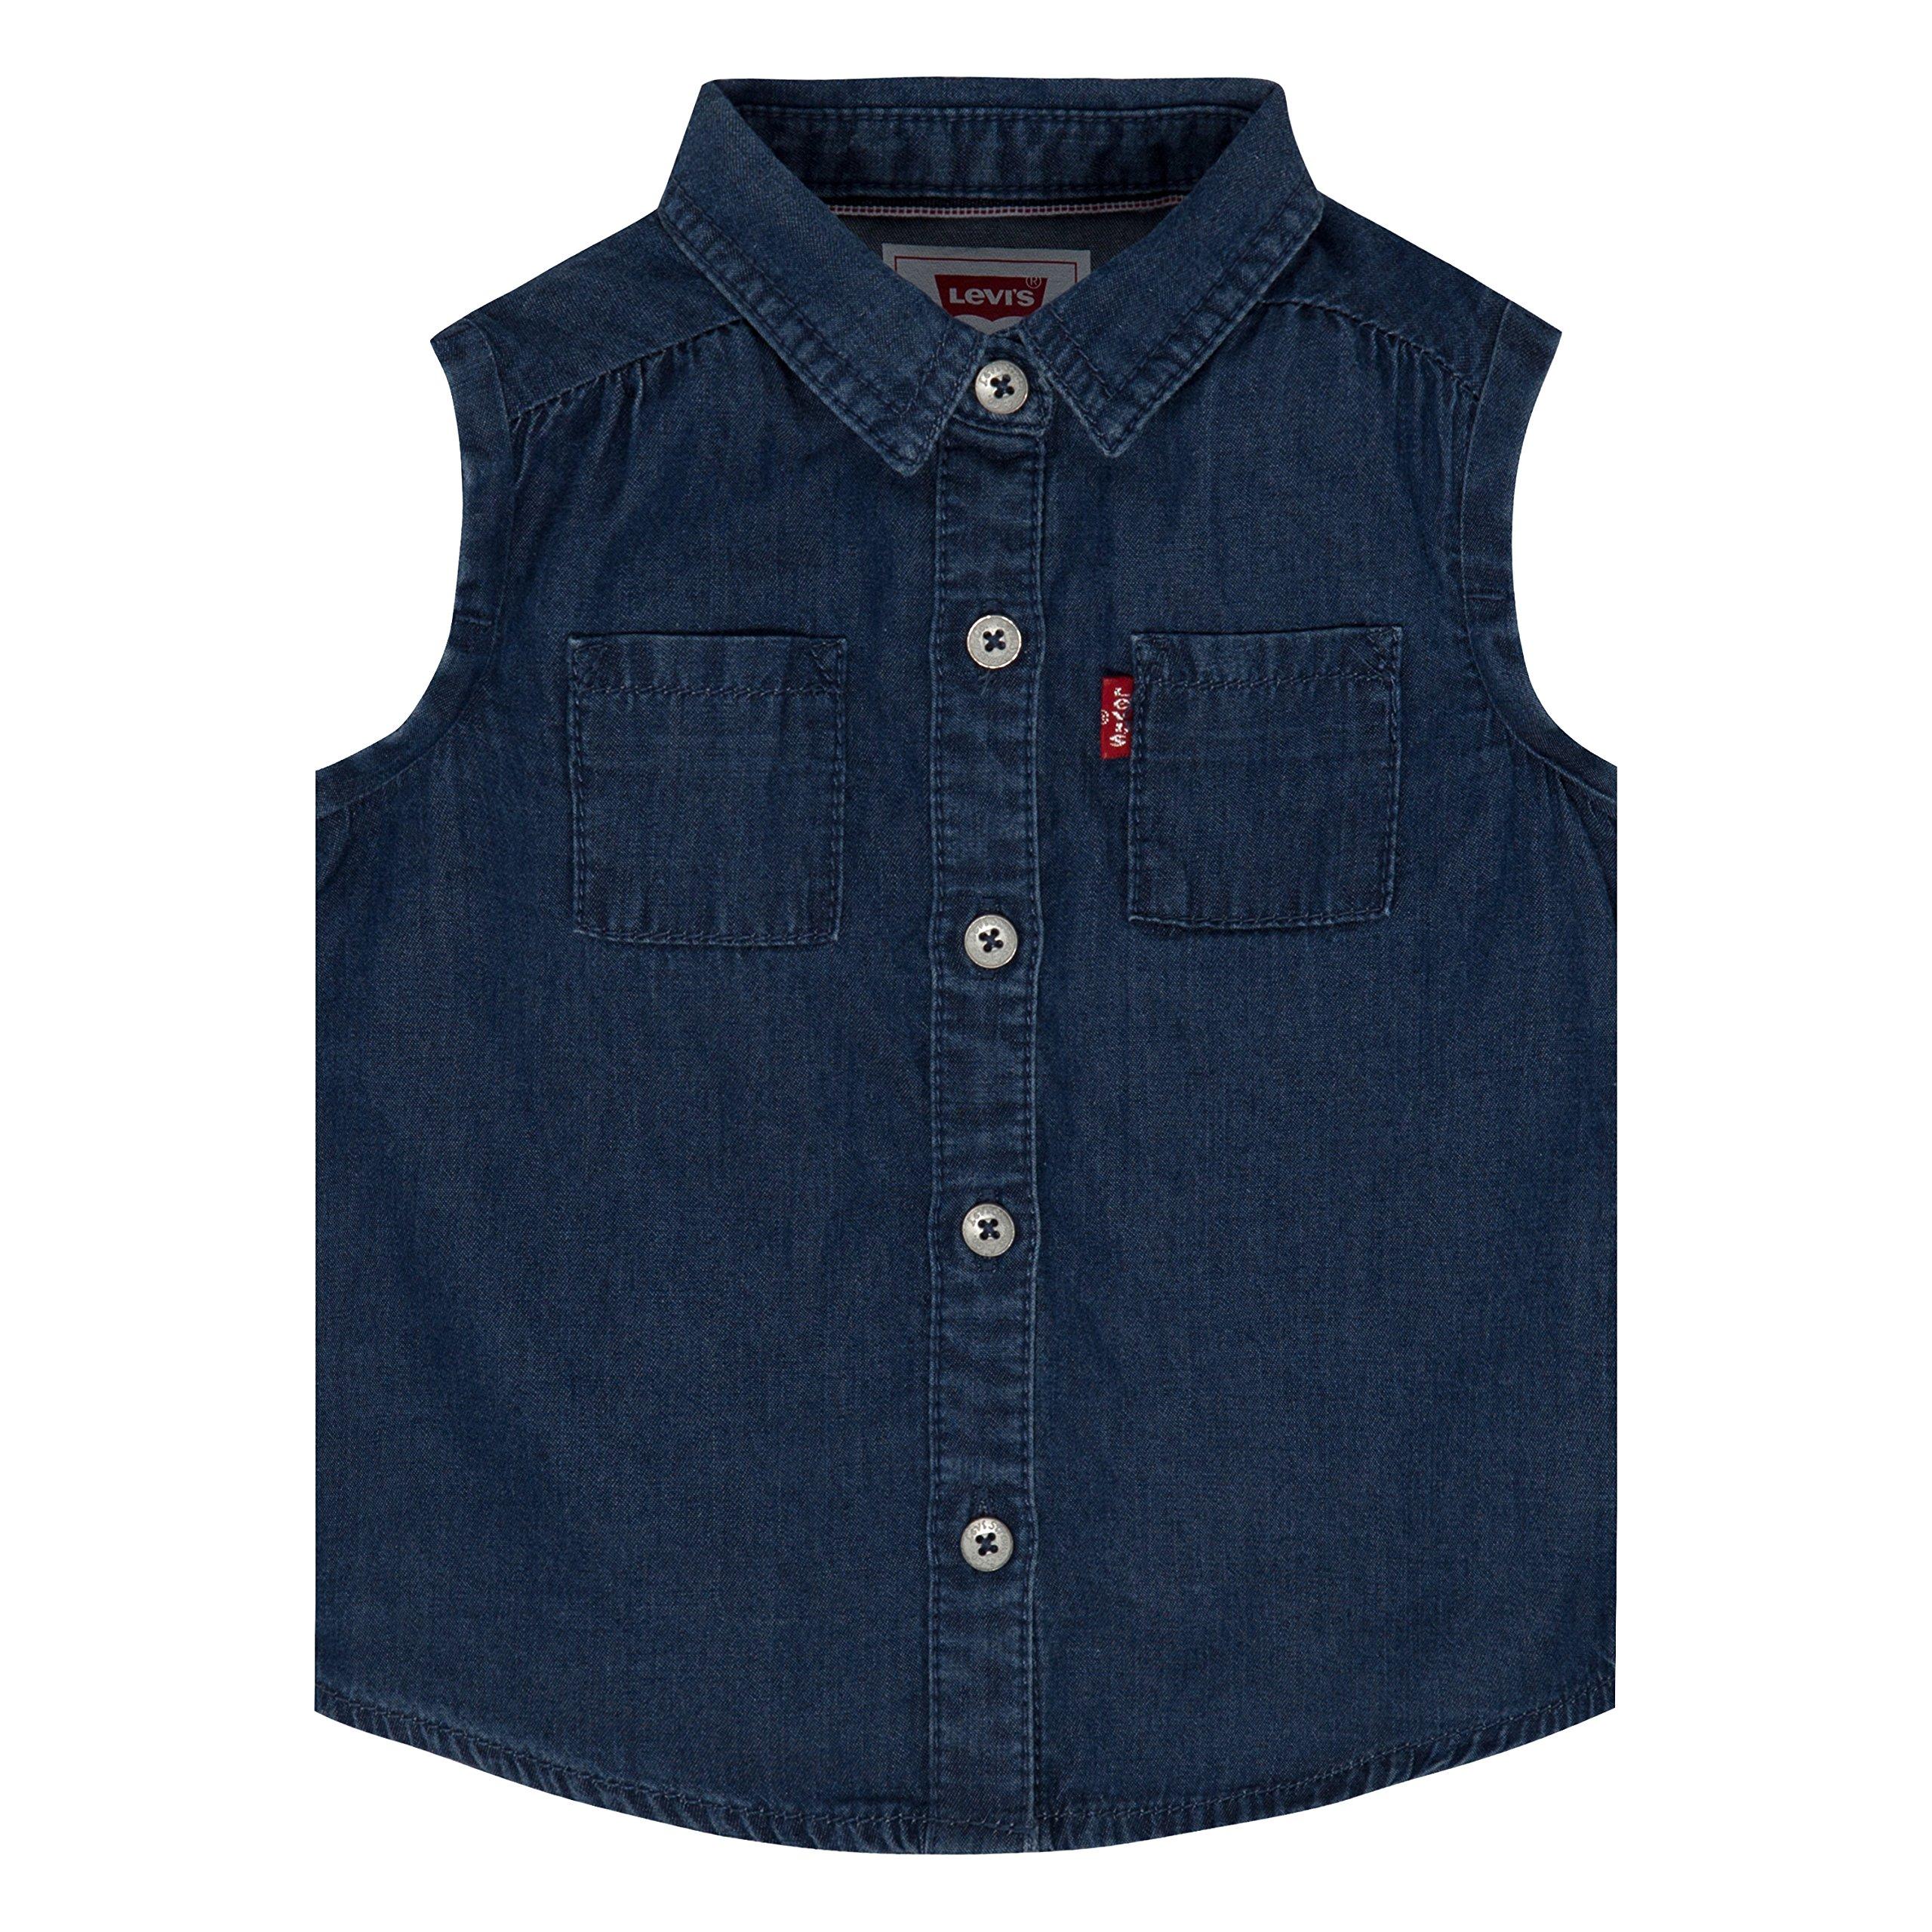 Levi's Baby Girls' Short Sleeve Shirt